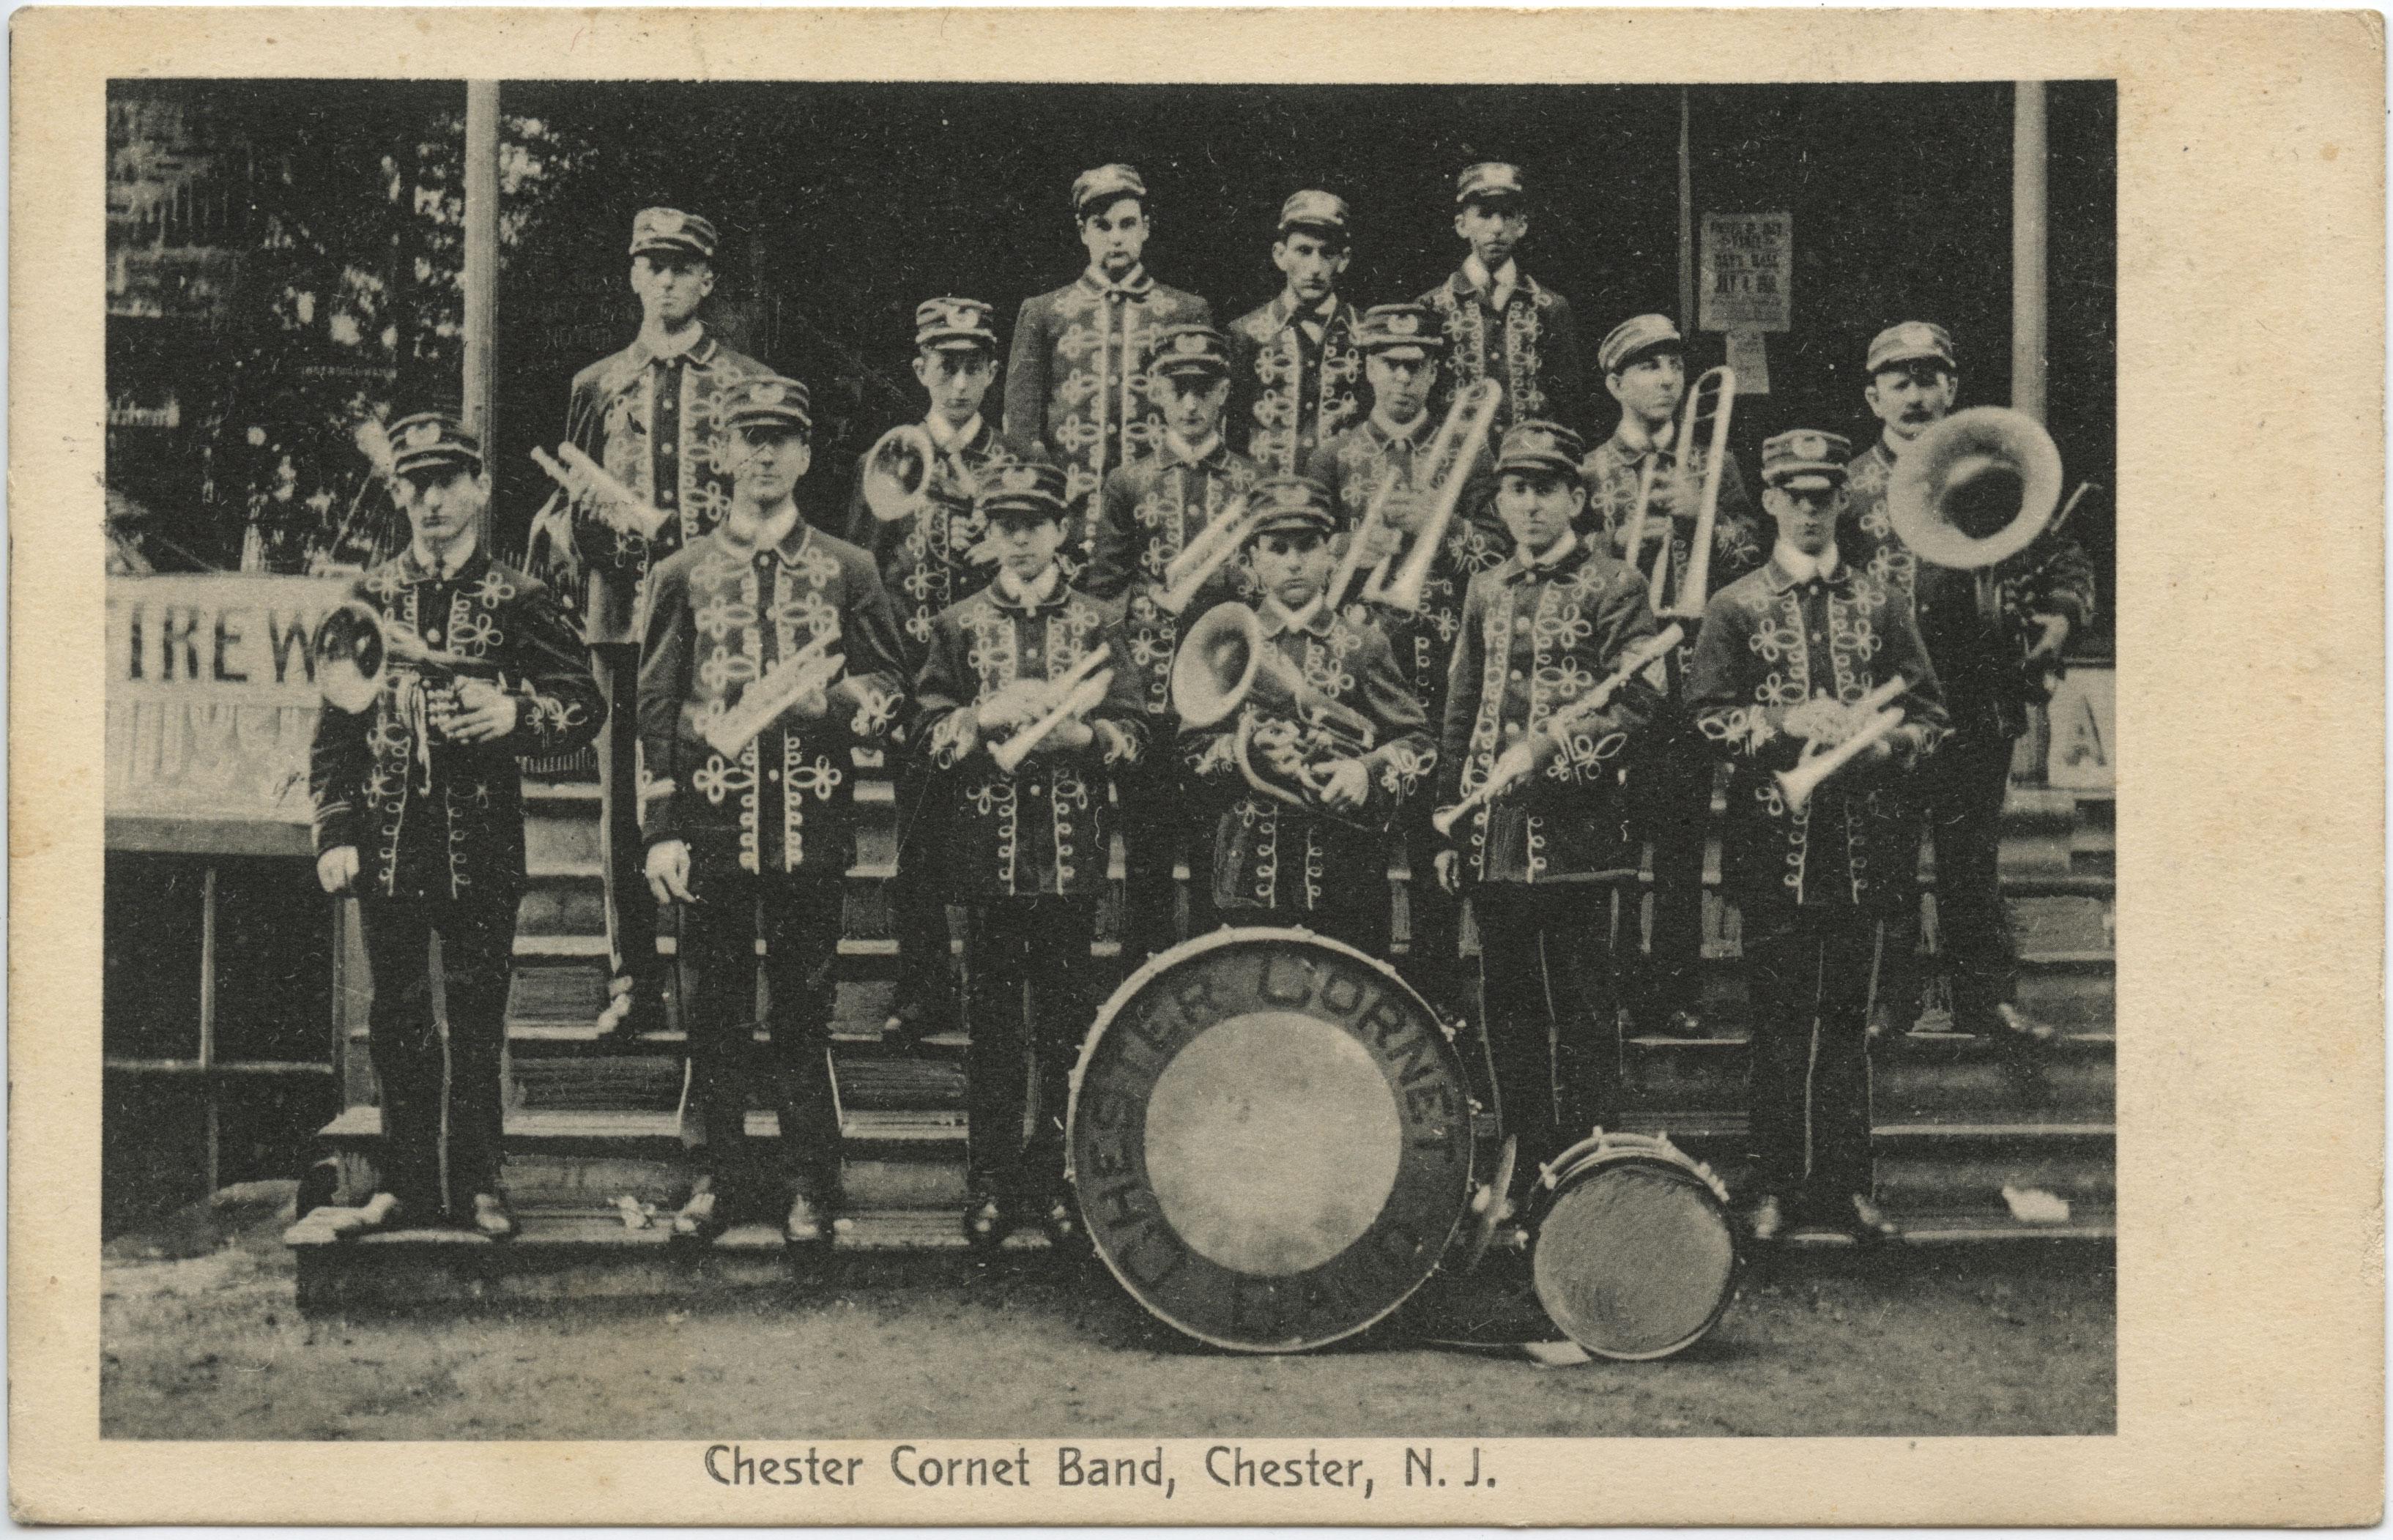 Chester Cornet Band